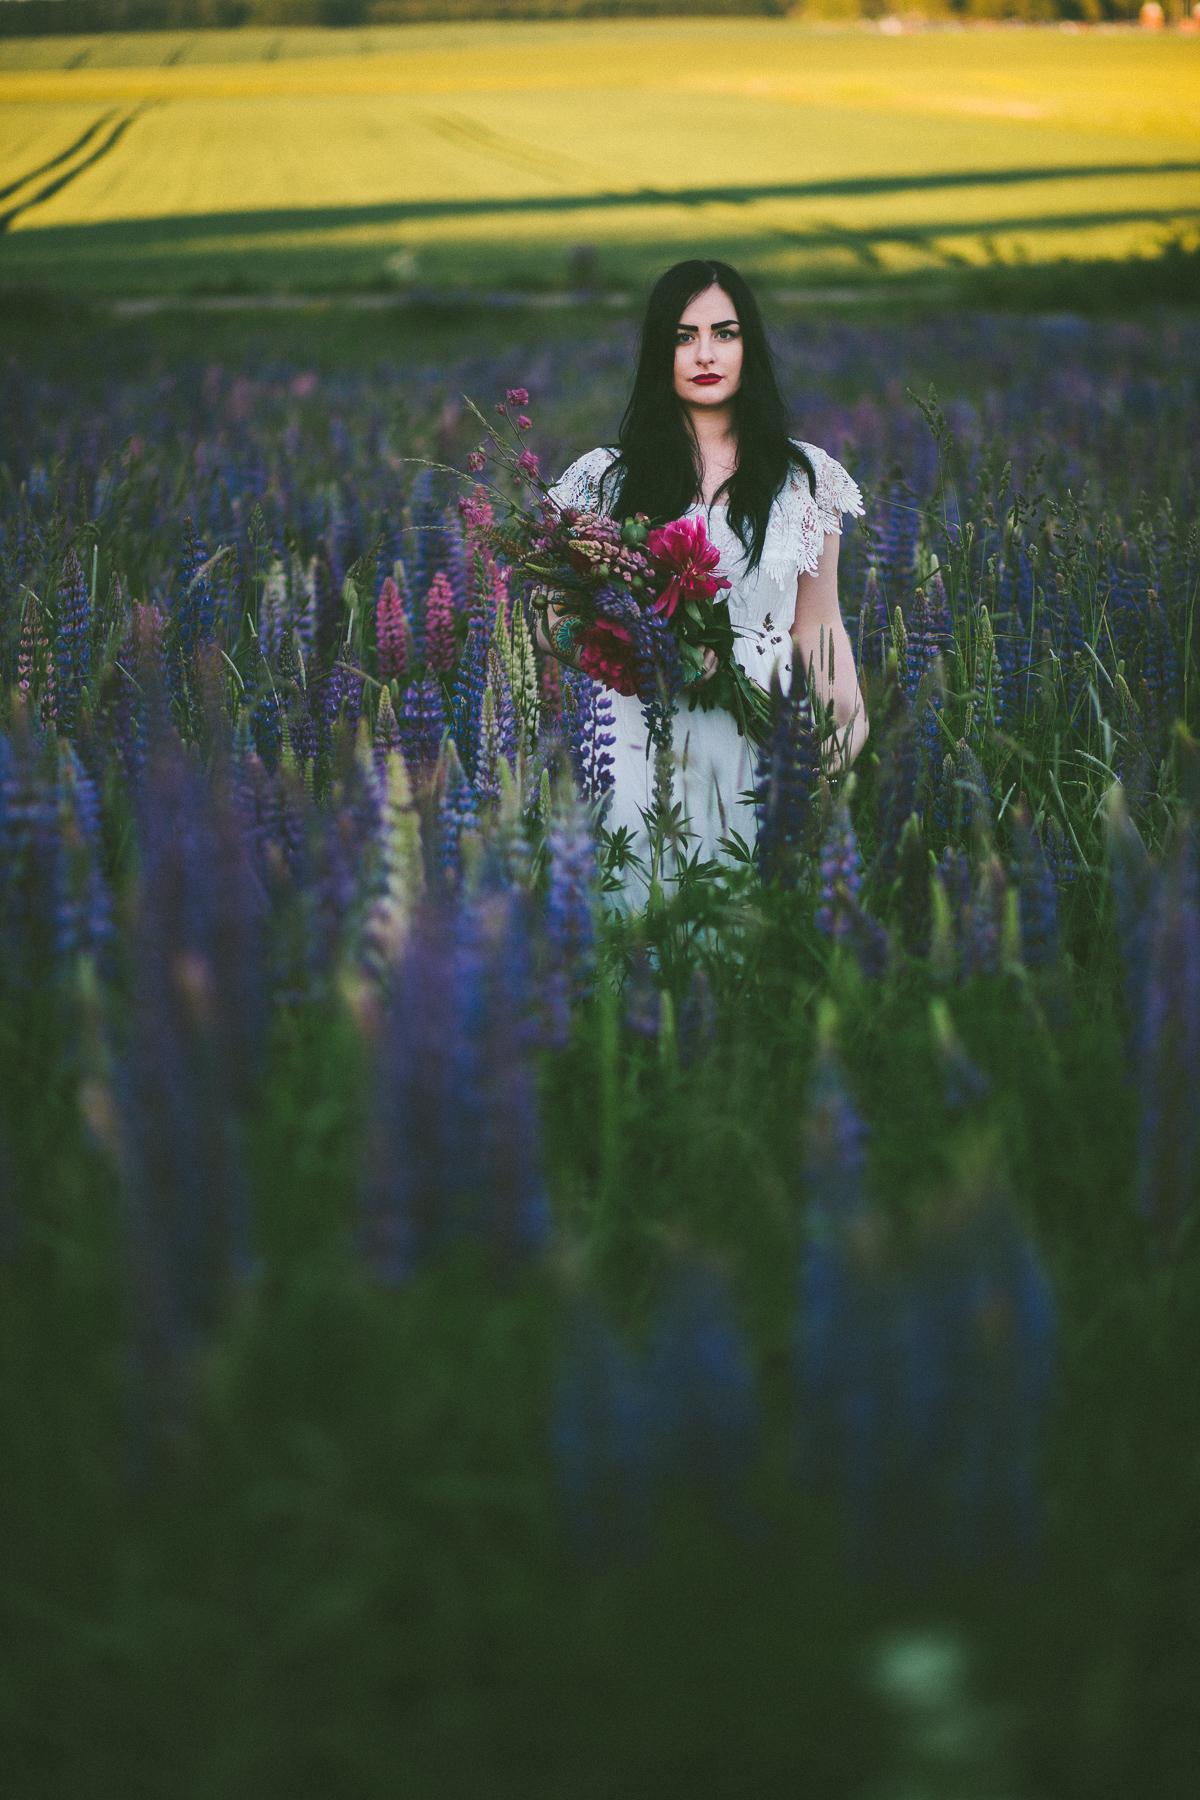 Sara-Bohemian-Moody-Alternative-Wedding-Photography-Inspiration-86